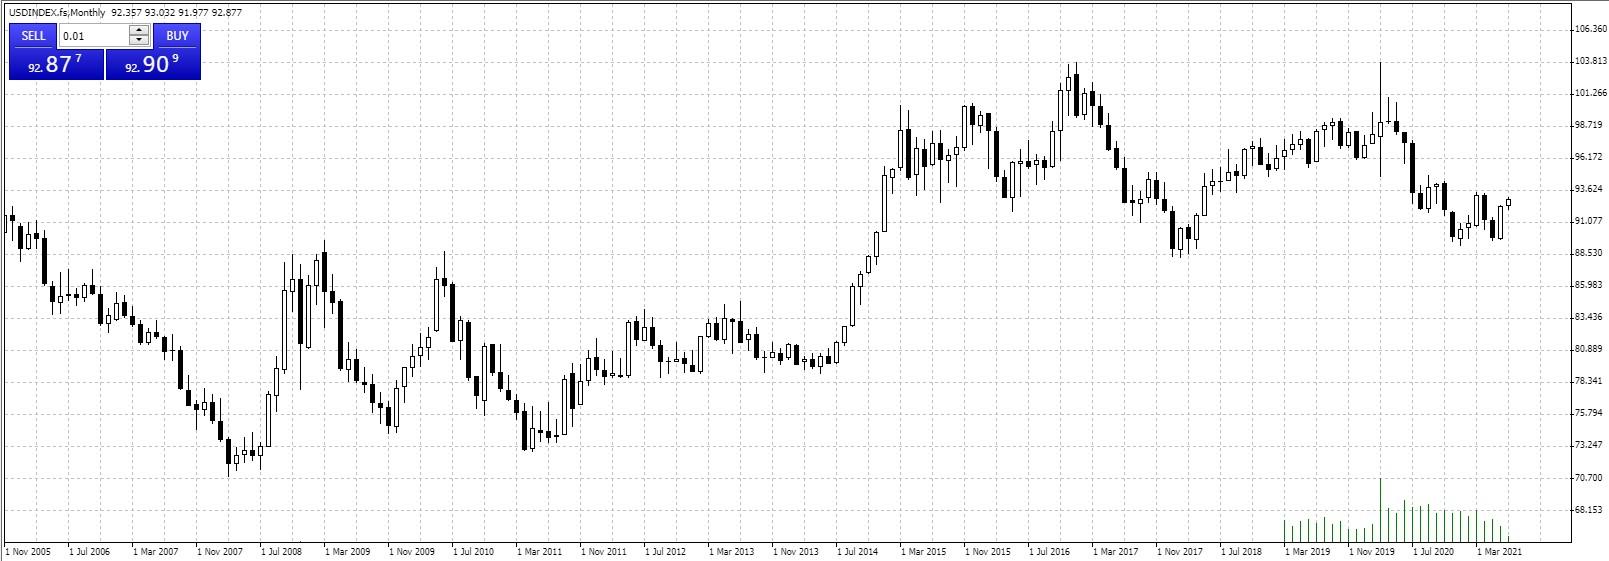 USIndex.fs monthly chart